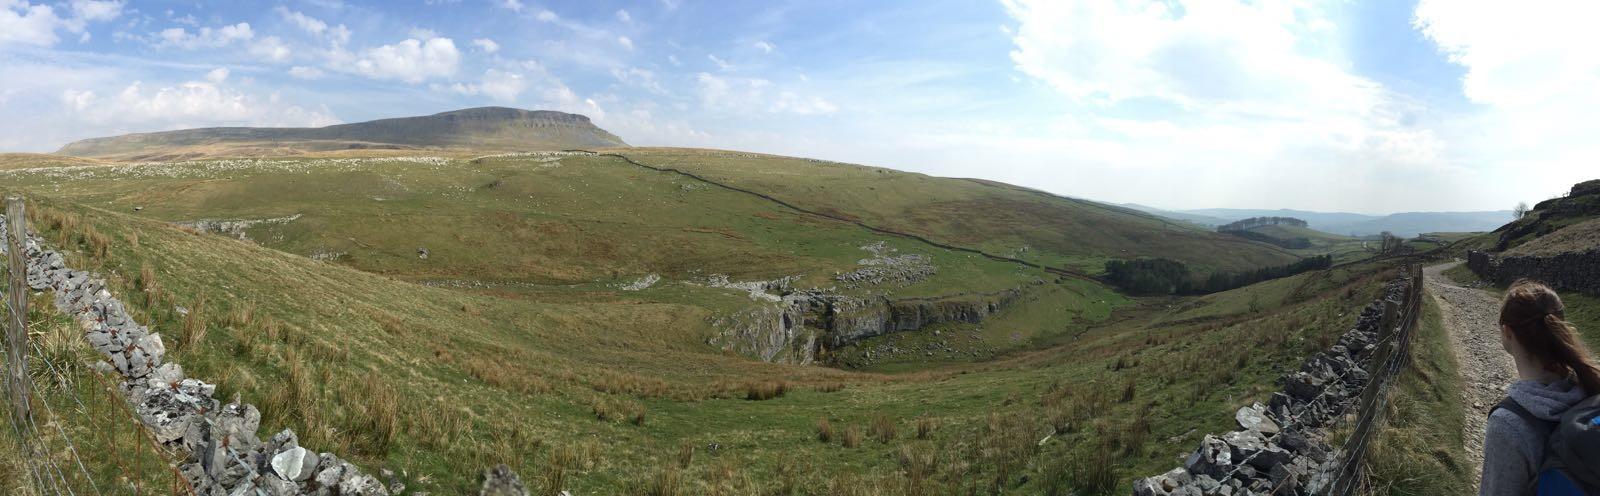 Yorkshire Dales - walking Pen-Y-Ghent